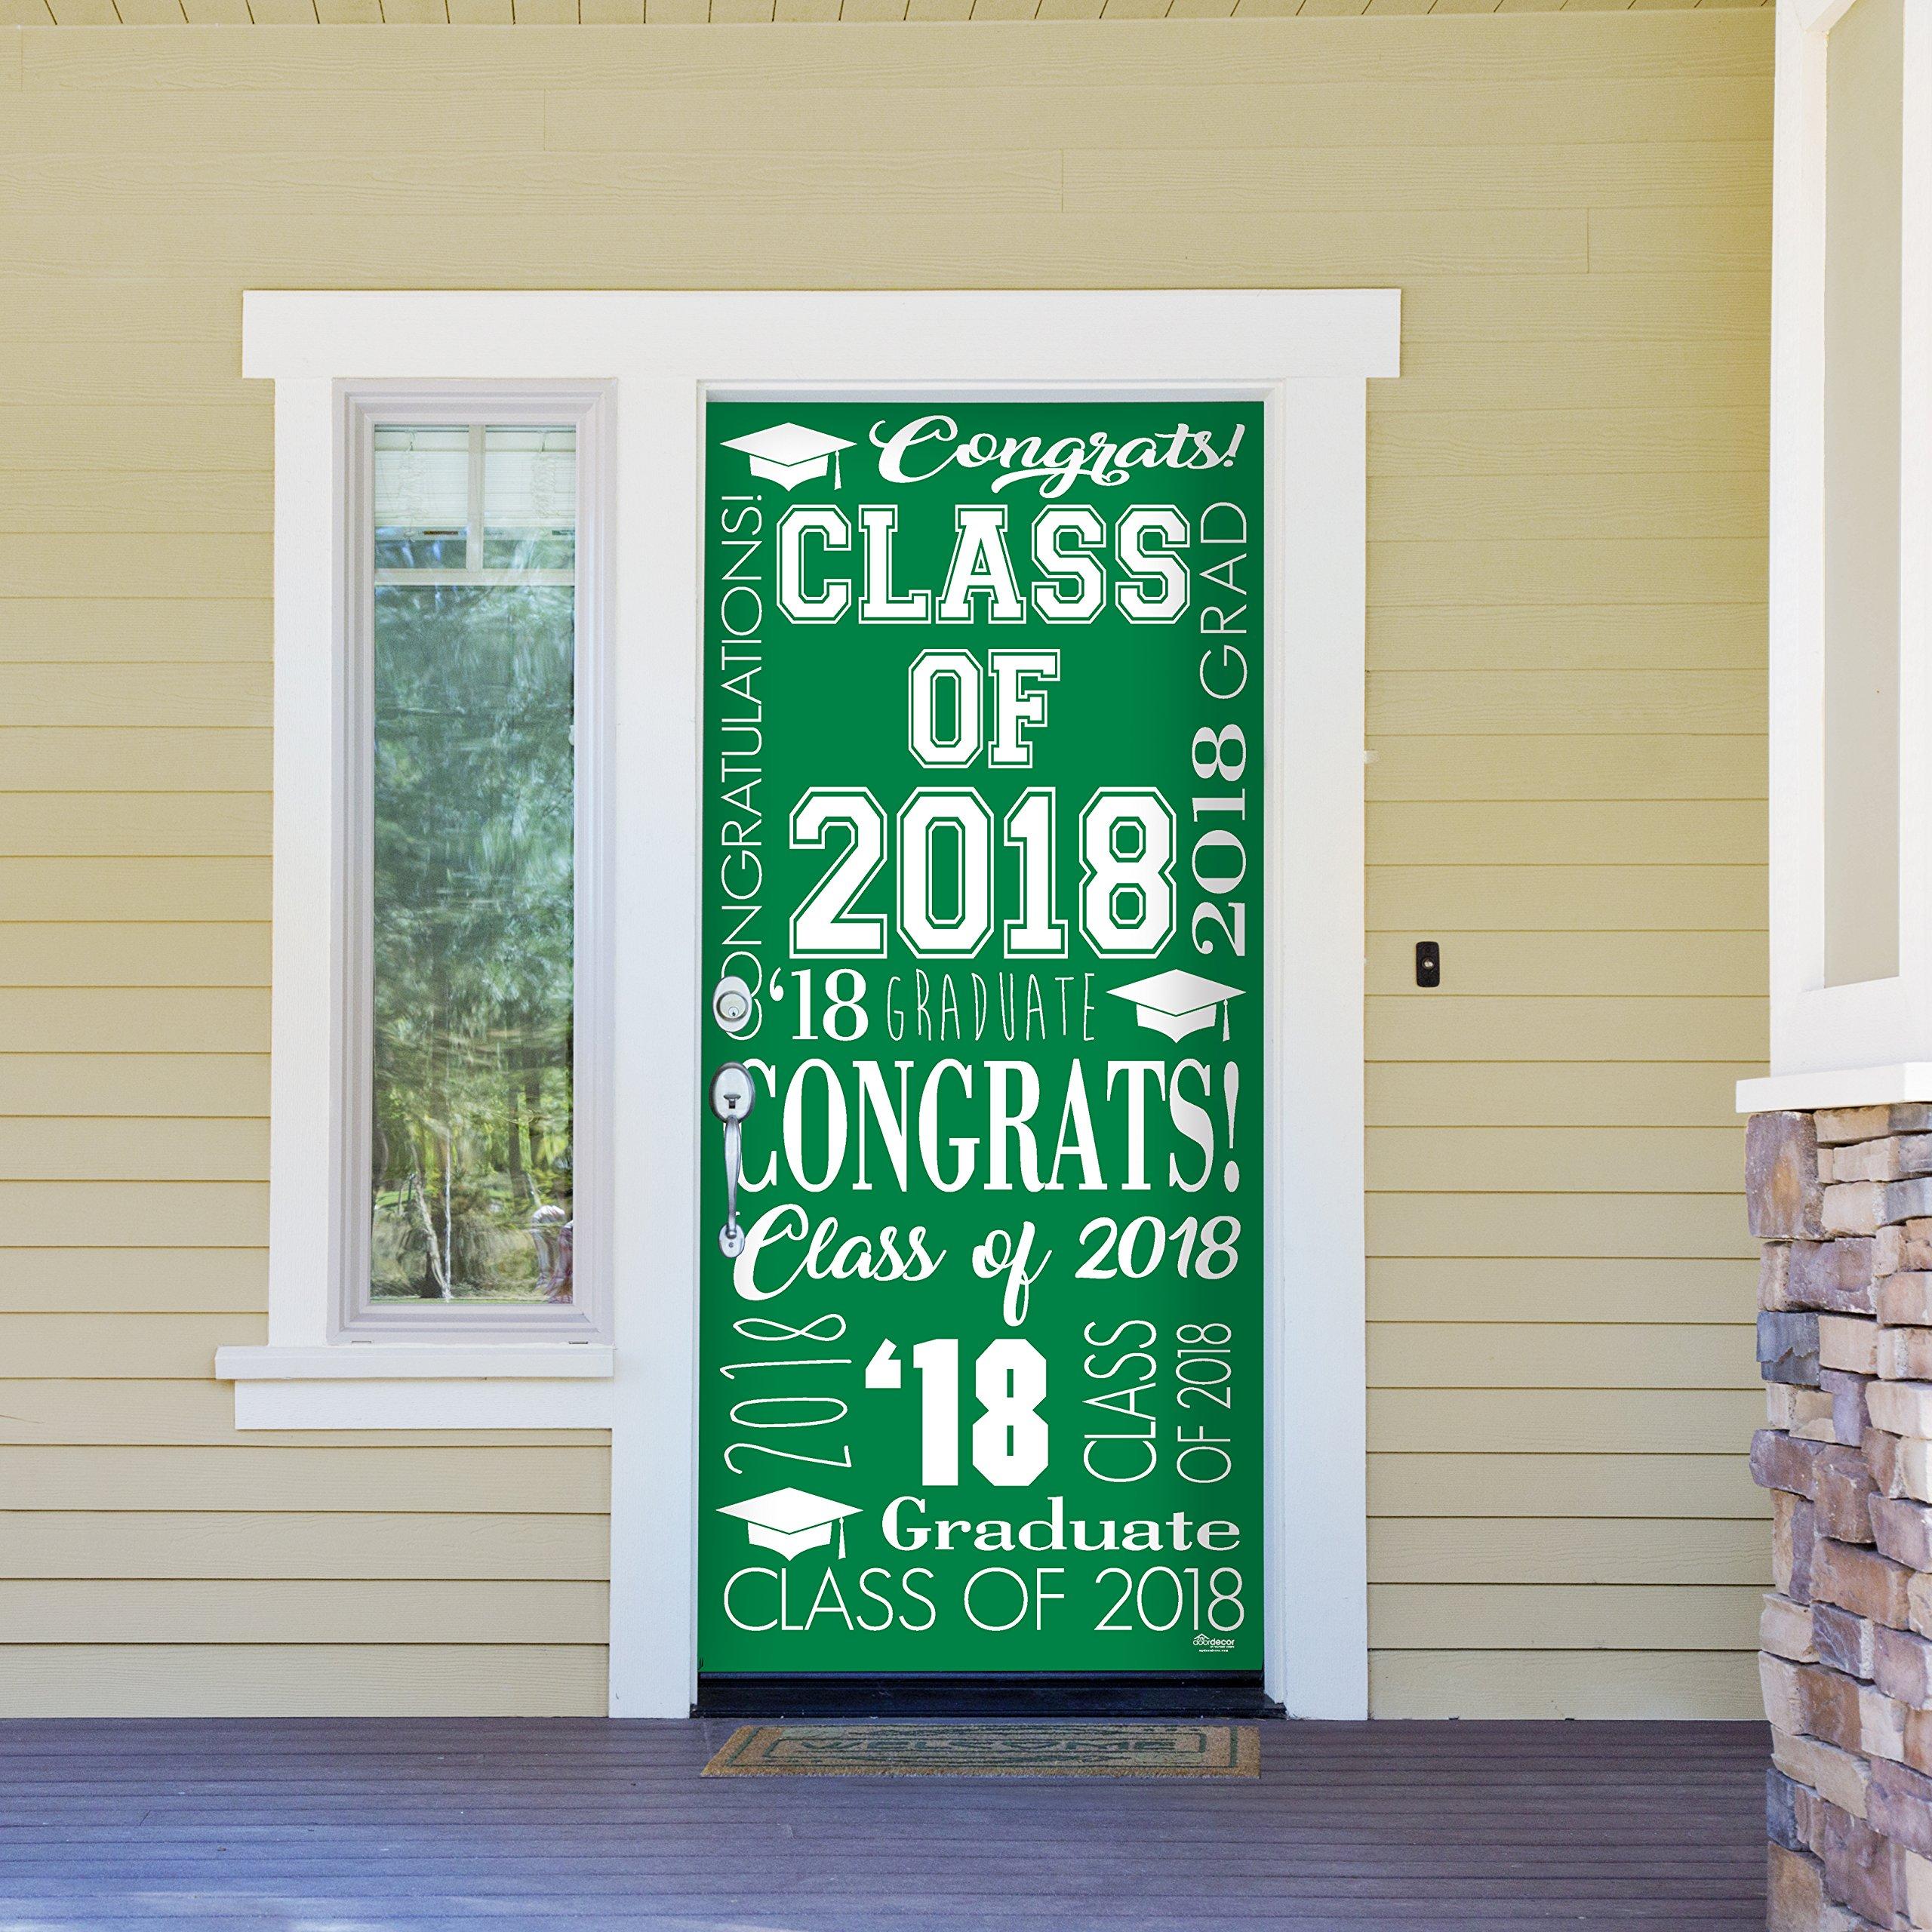 Victory Corps Collage Green - Outdoor GRADUATION Garage Door Banner Mural Sign Décor 36'' x 80'' One Size Fits All Front Door Car Garage -The Original Holiday Front Door Banner Decor